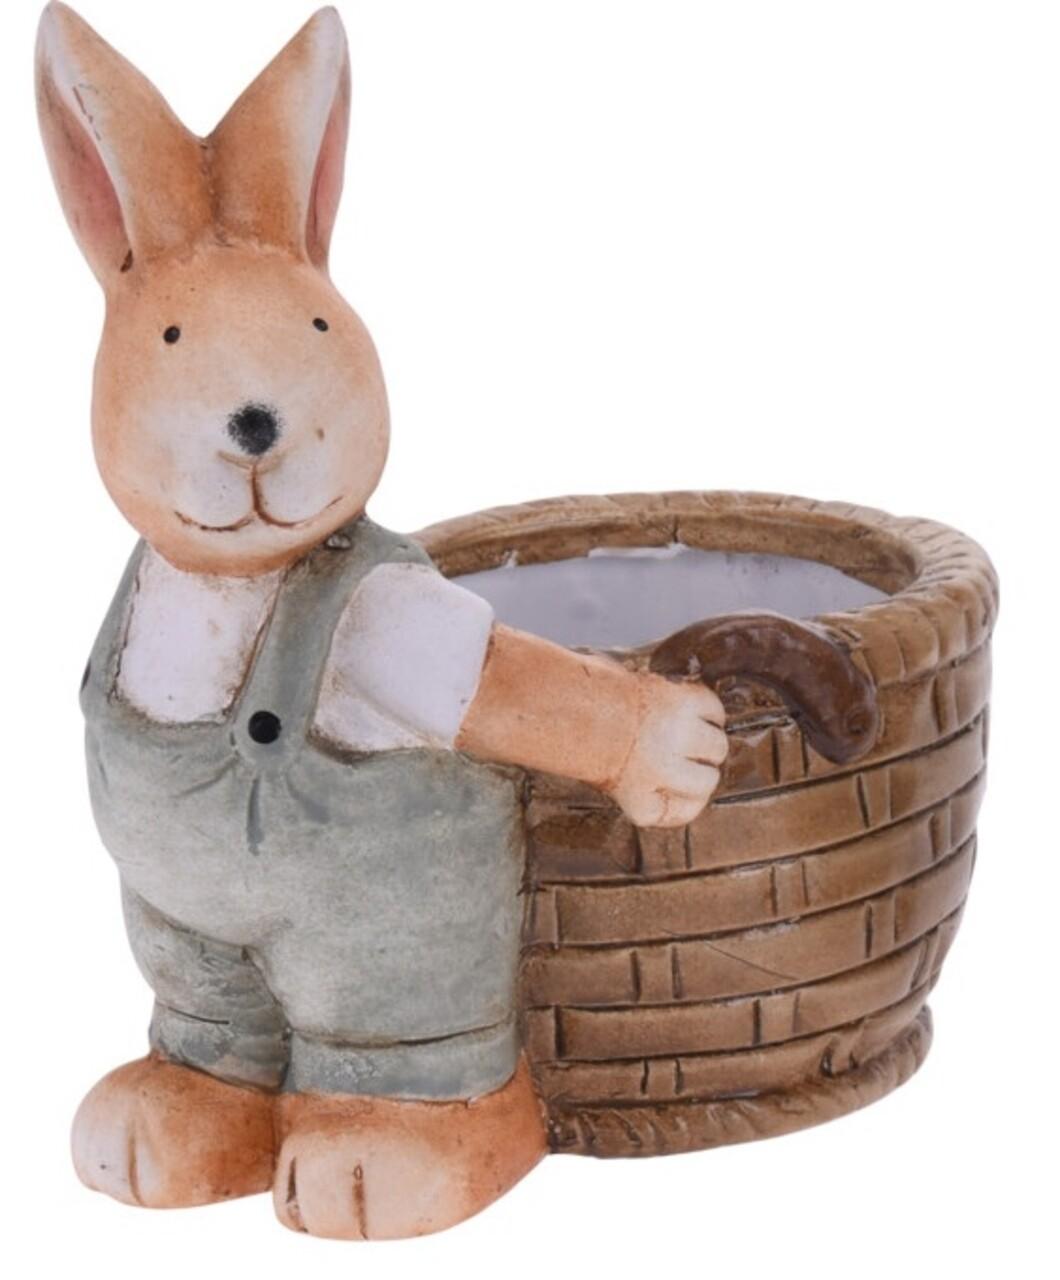 Decoratiune de paste Boy bunny with basket, 13x8.5x15.5 cm, teracota, gri